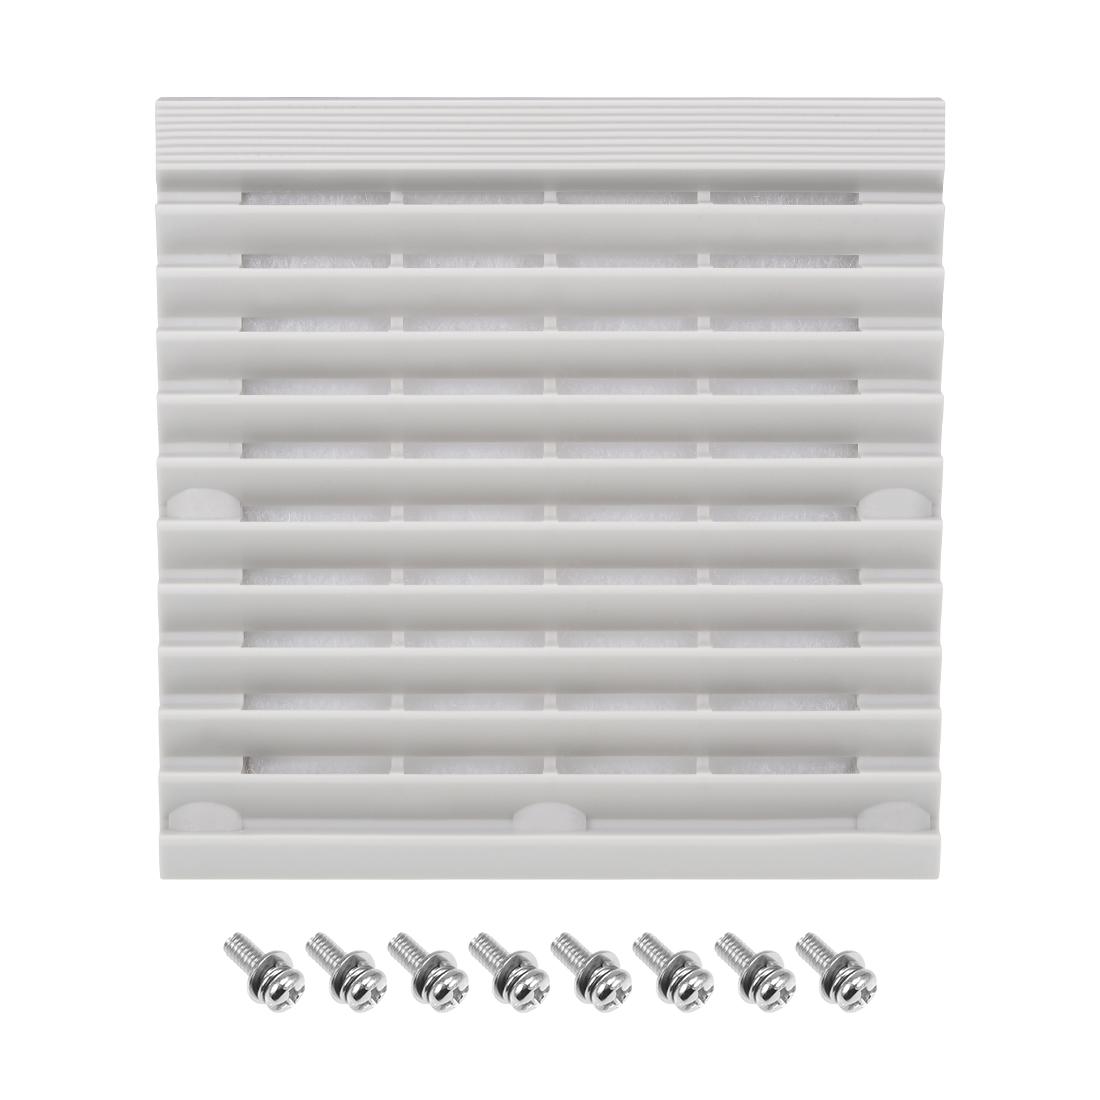 150mm x 150mm ABS Housing Dustproof Sponge Ventilator Filter System Grille